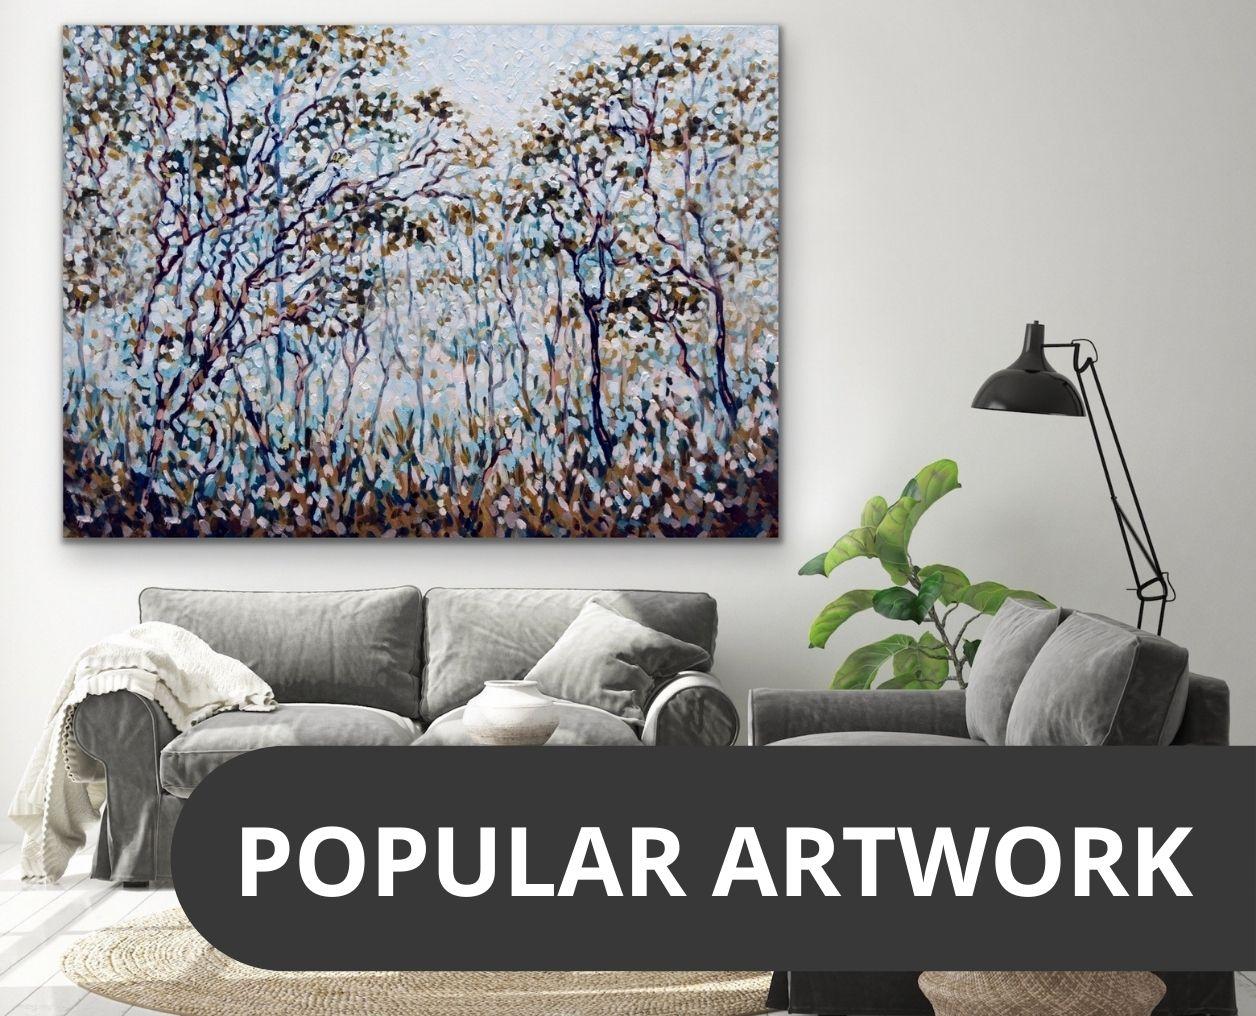 Popular Artwork